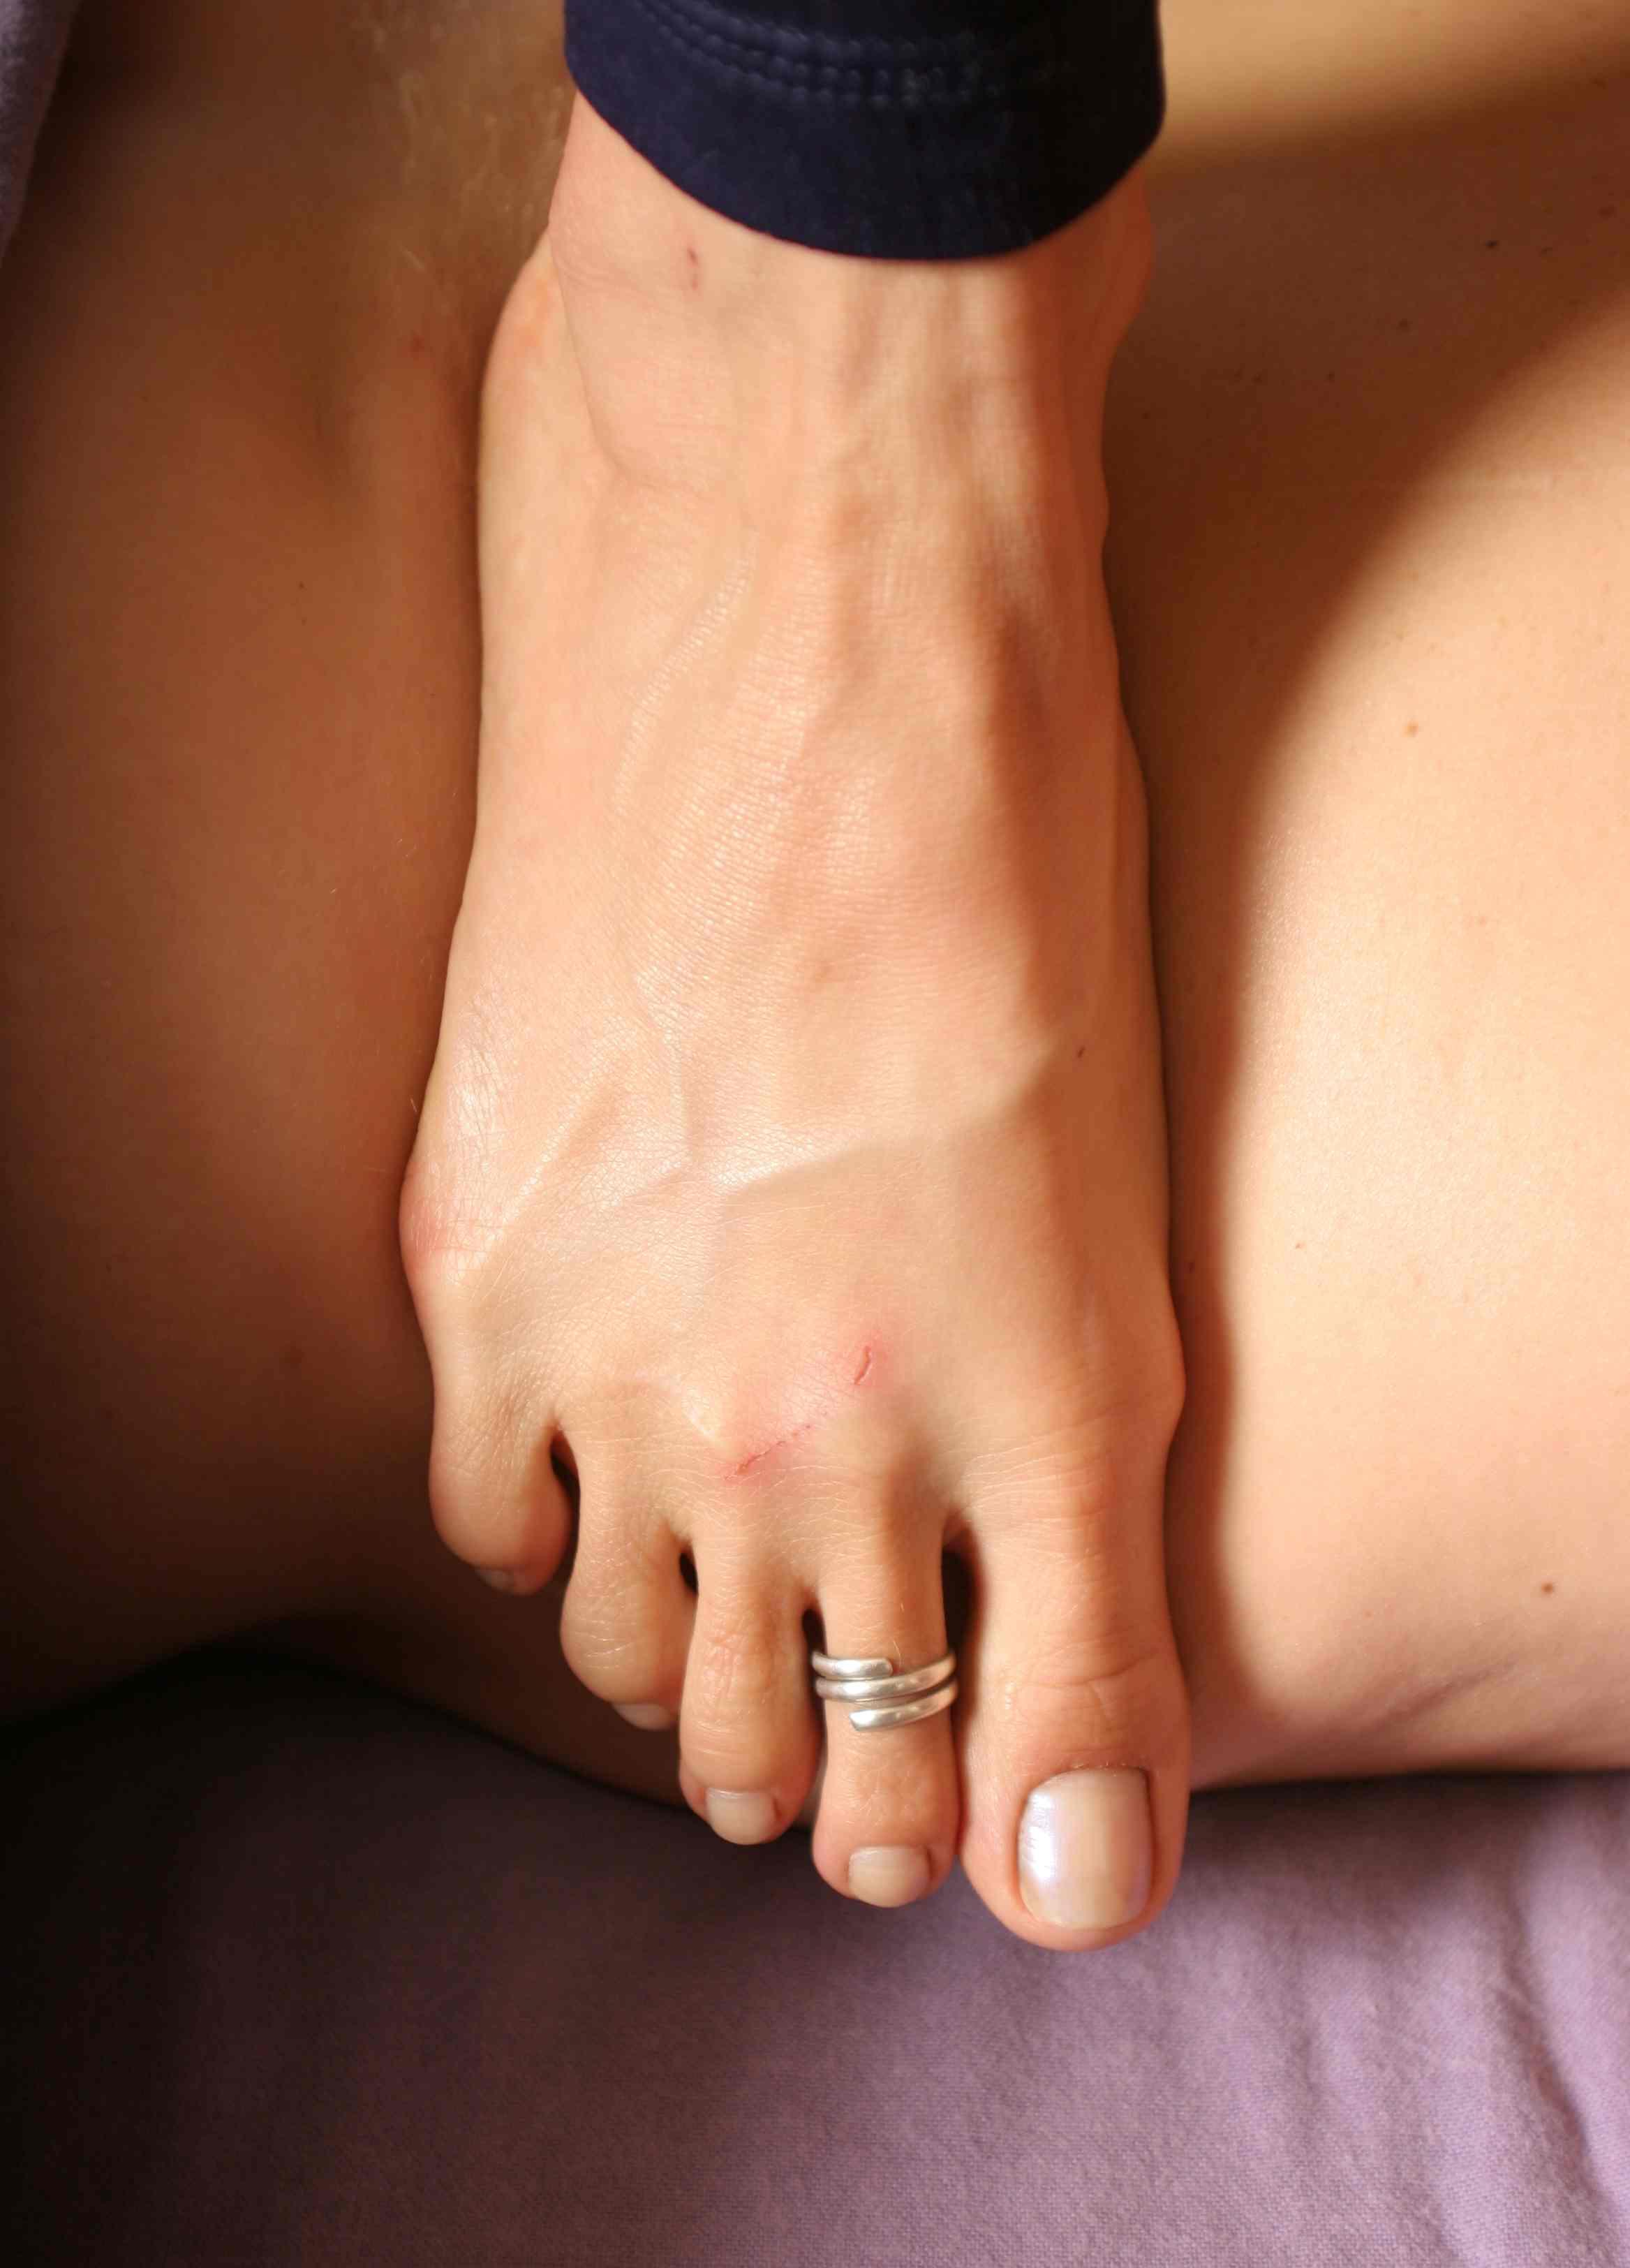 oh my aching feet